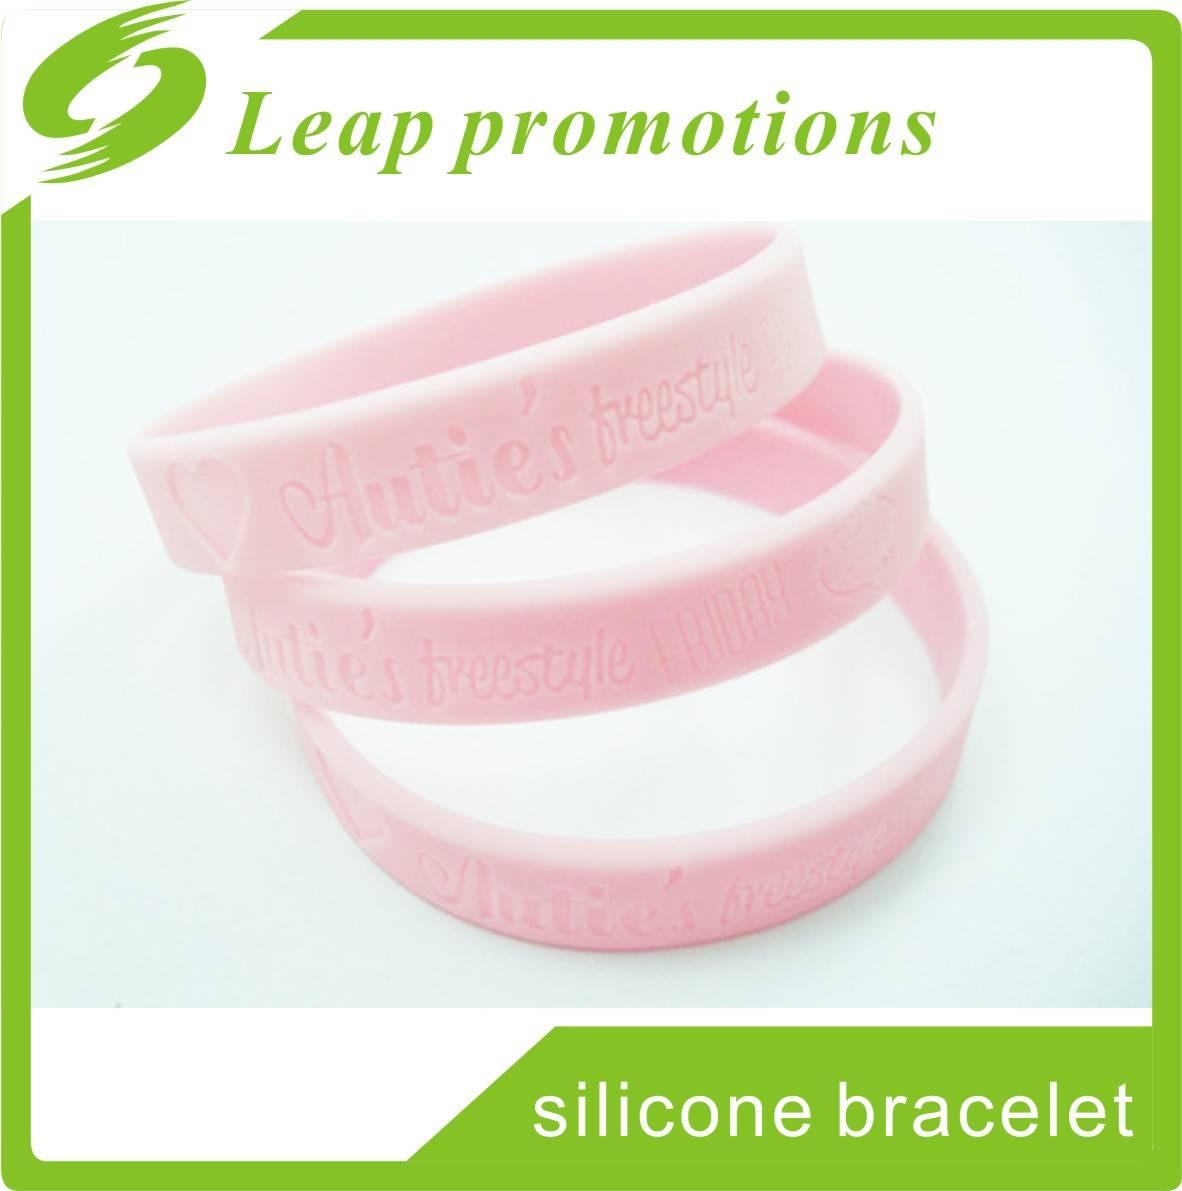 2016 Hot selling cheap custom silicone bracelets fashion silicone bracelets personalized band